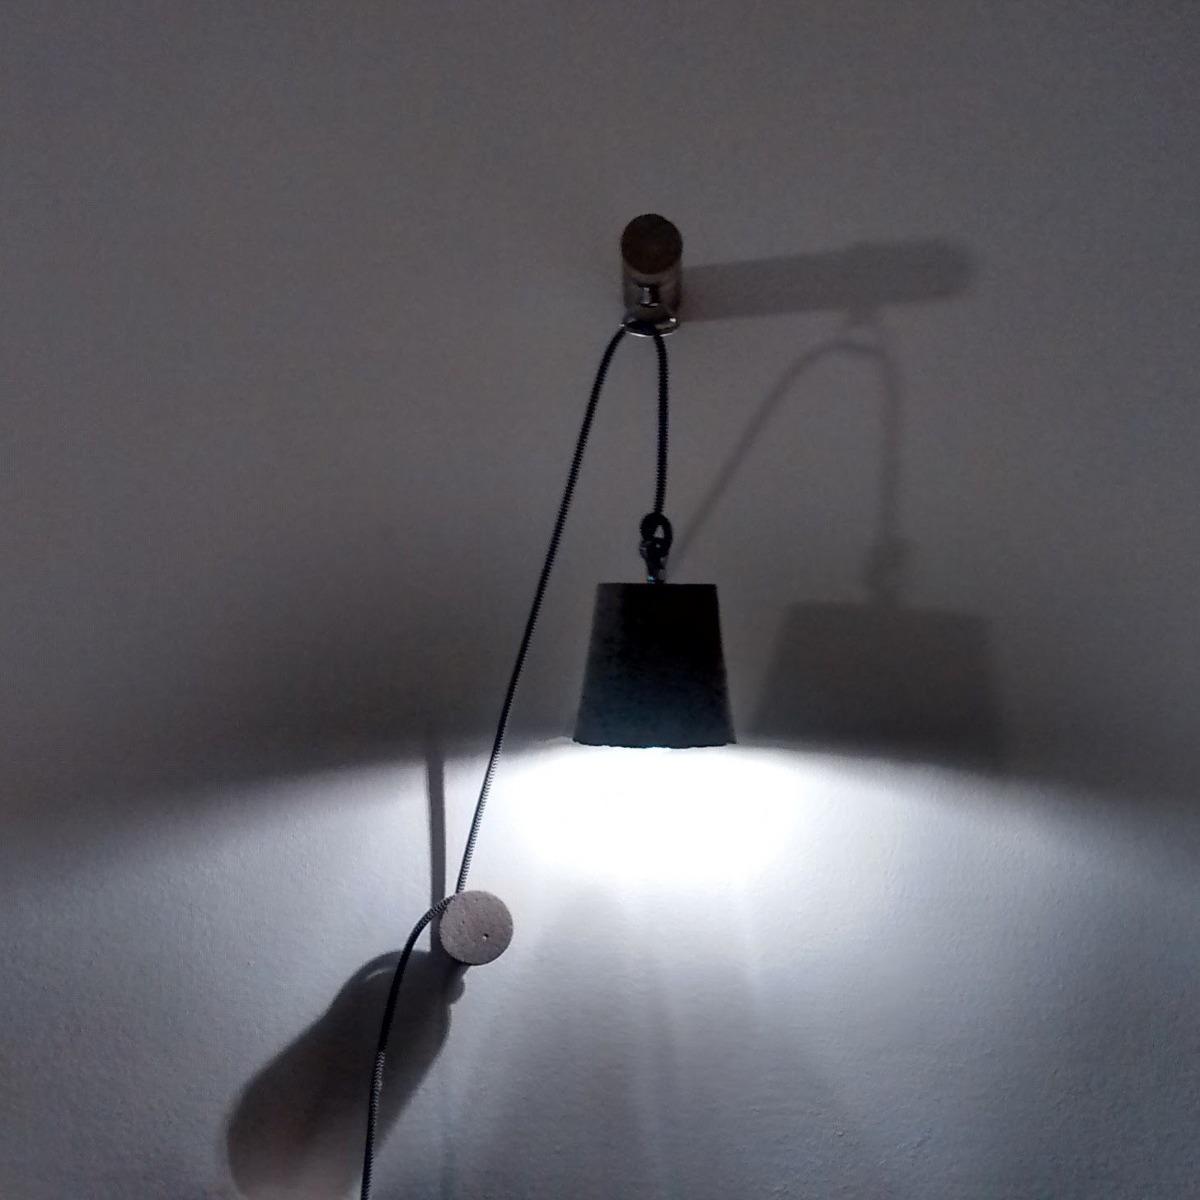 lampara colgante pared cemento diseo minimalista regulable cargando zoom